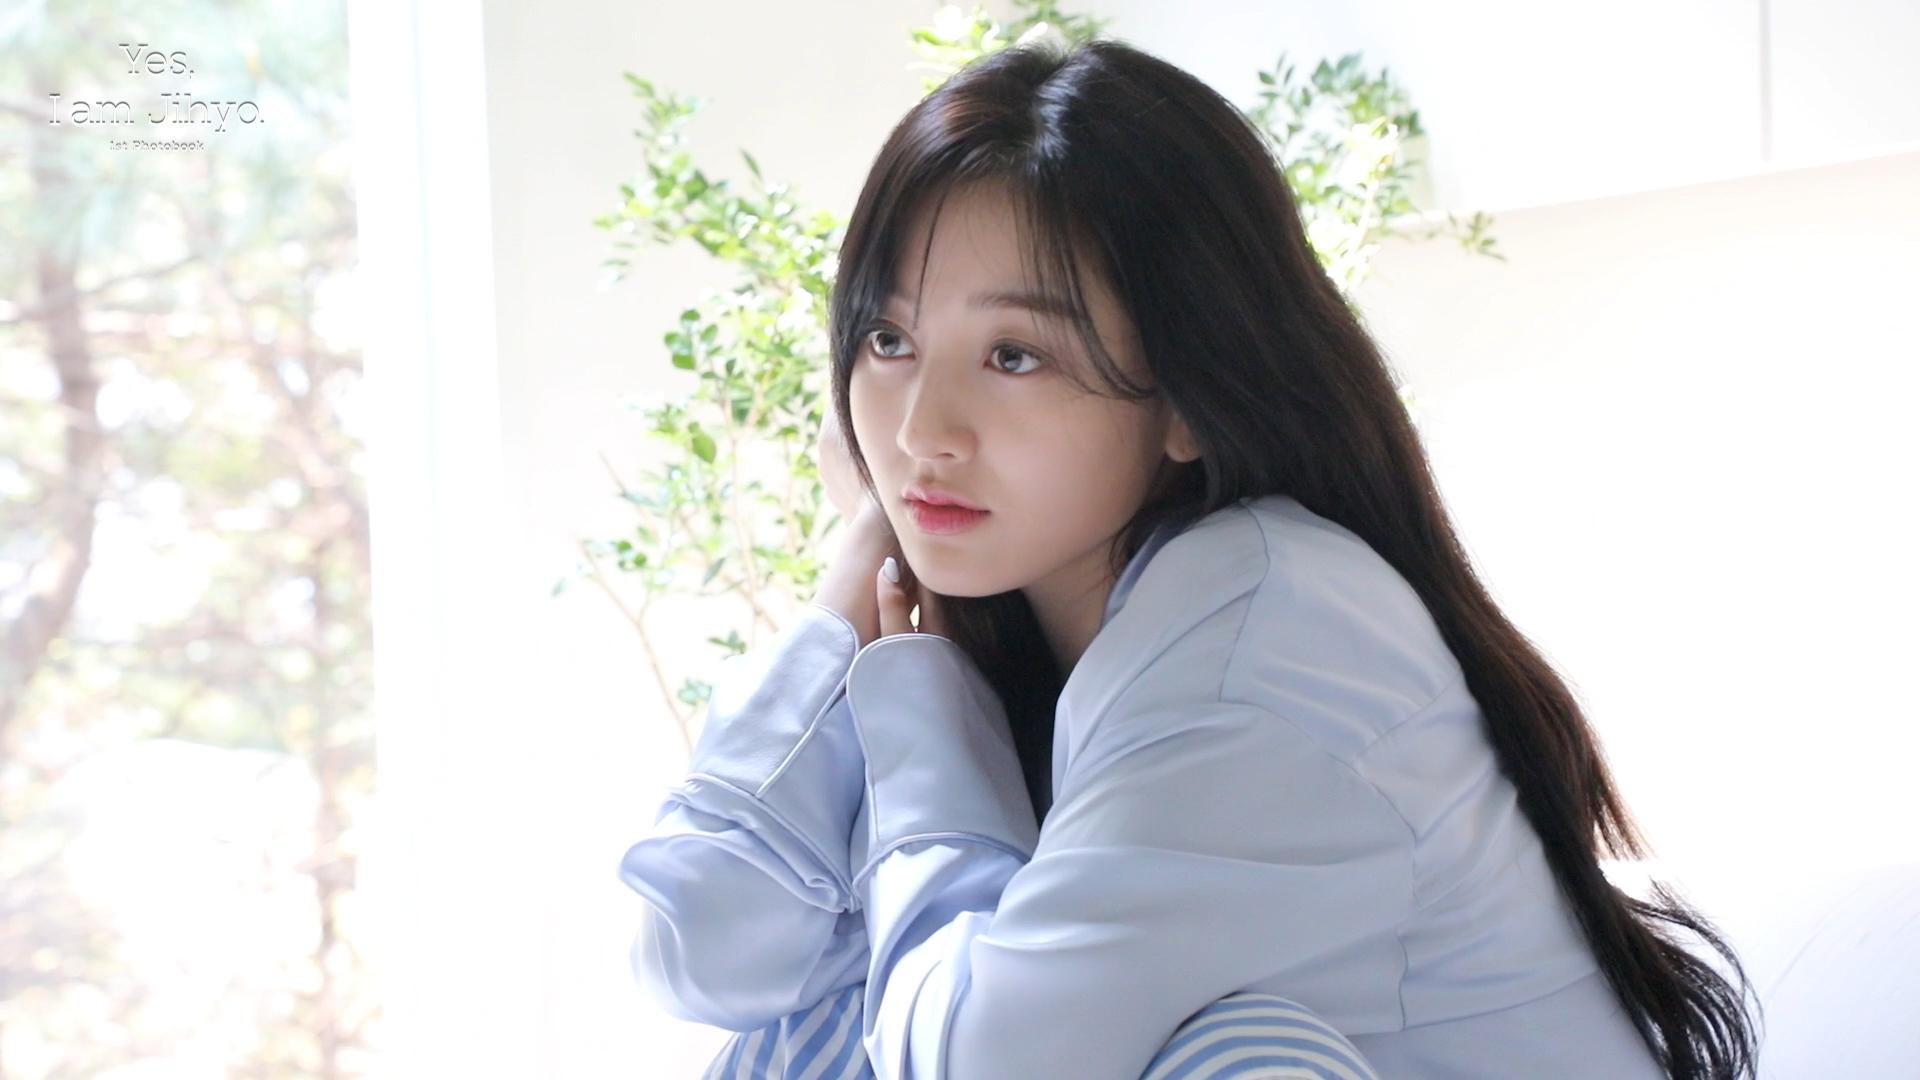 Yes, I am Jihyo. Behind the Scenes